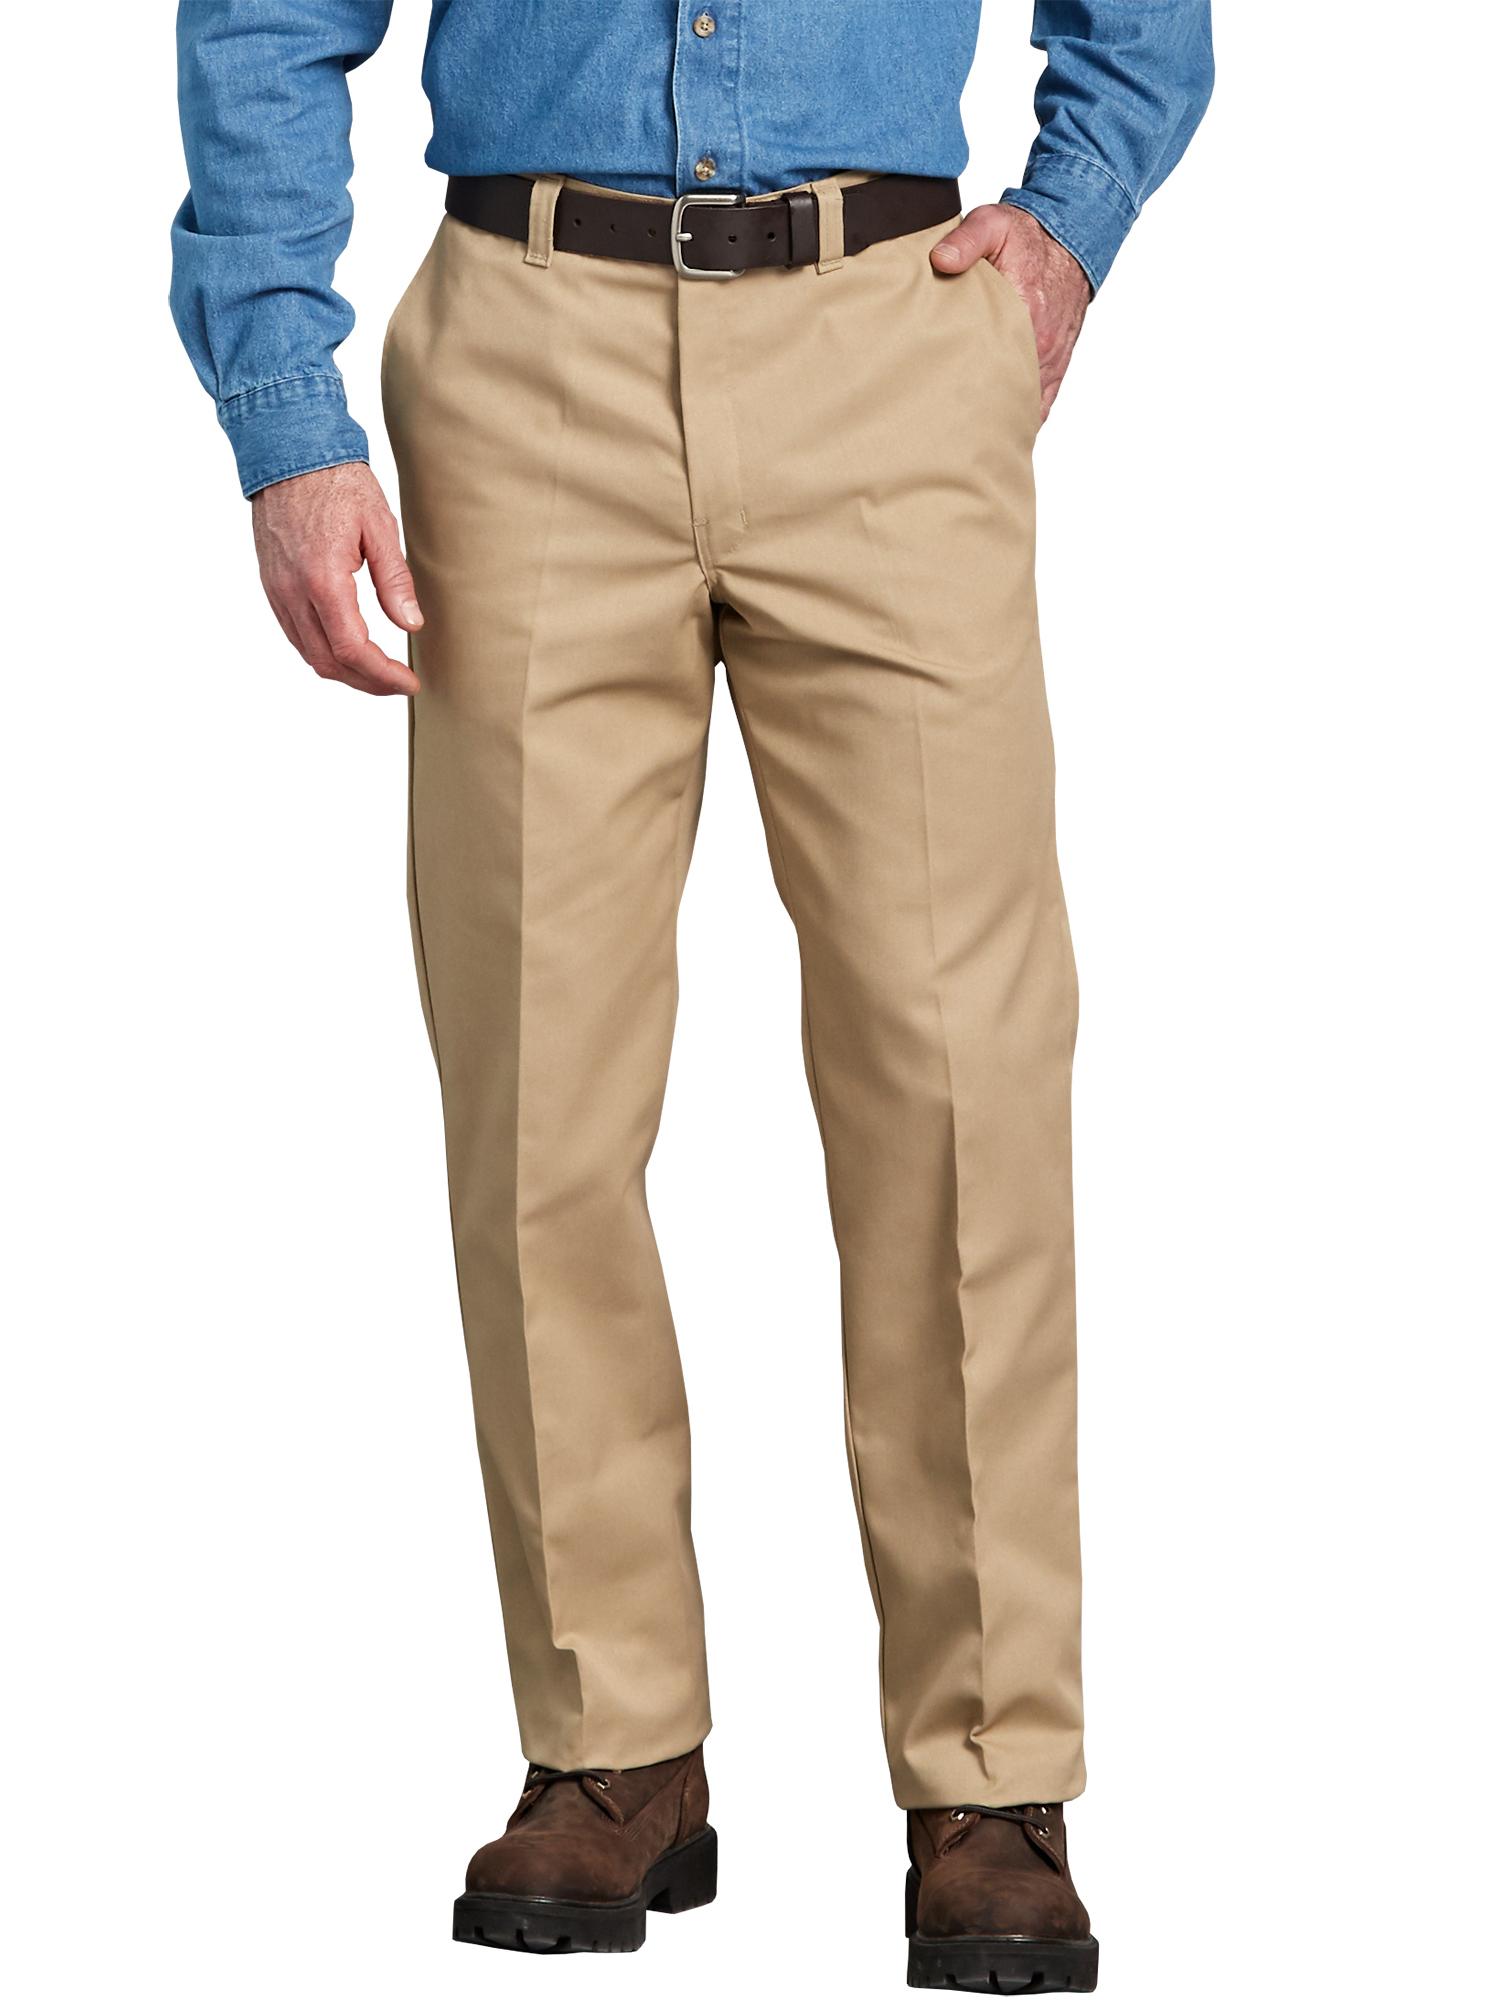 Big Men's Regular Fit Straight Leg Flat Front Pant